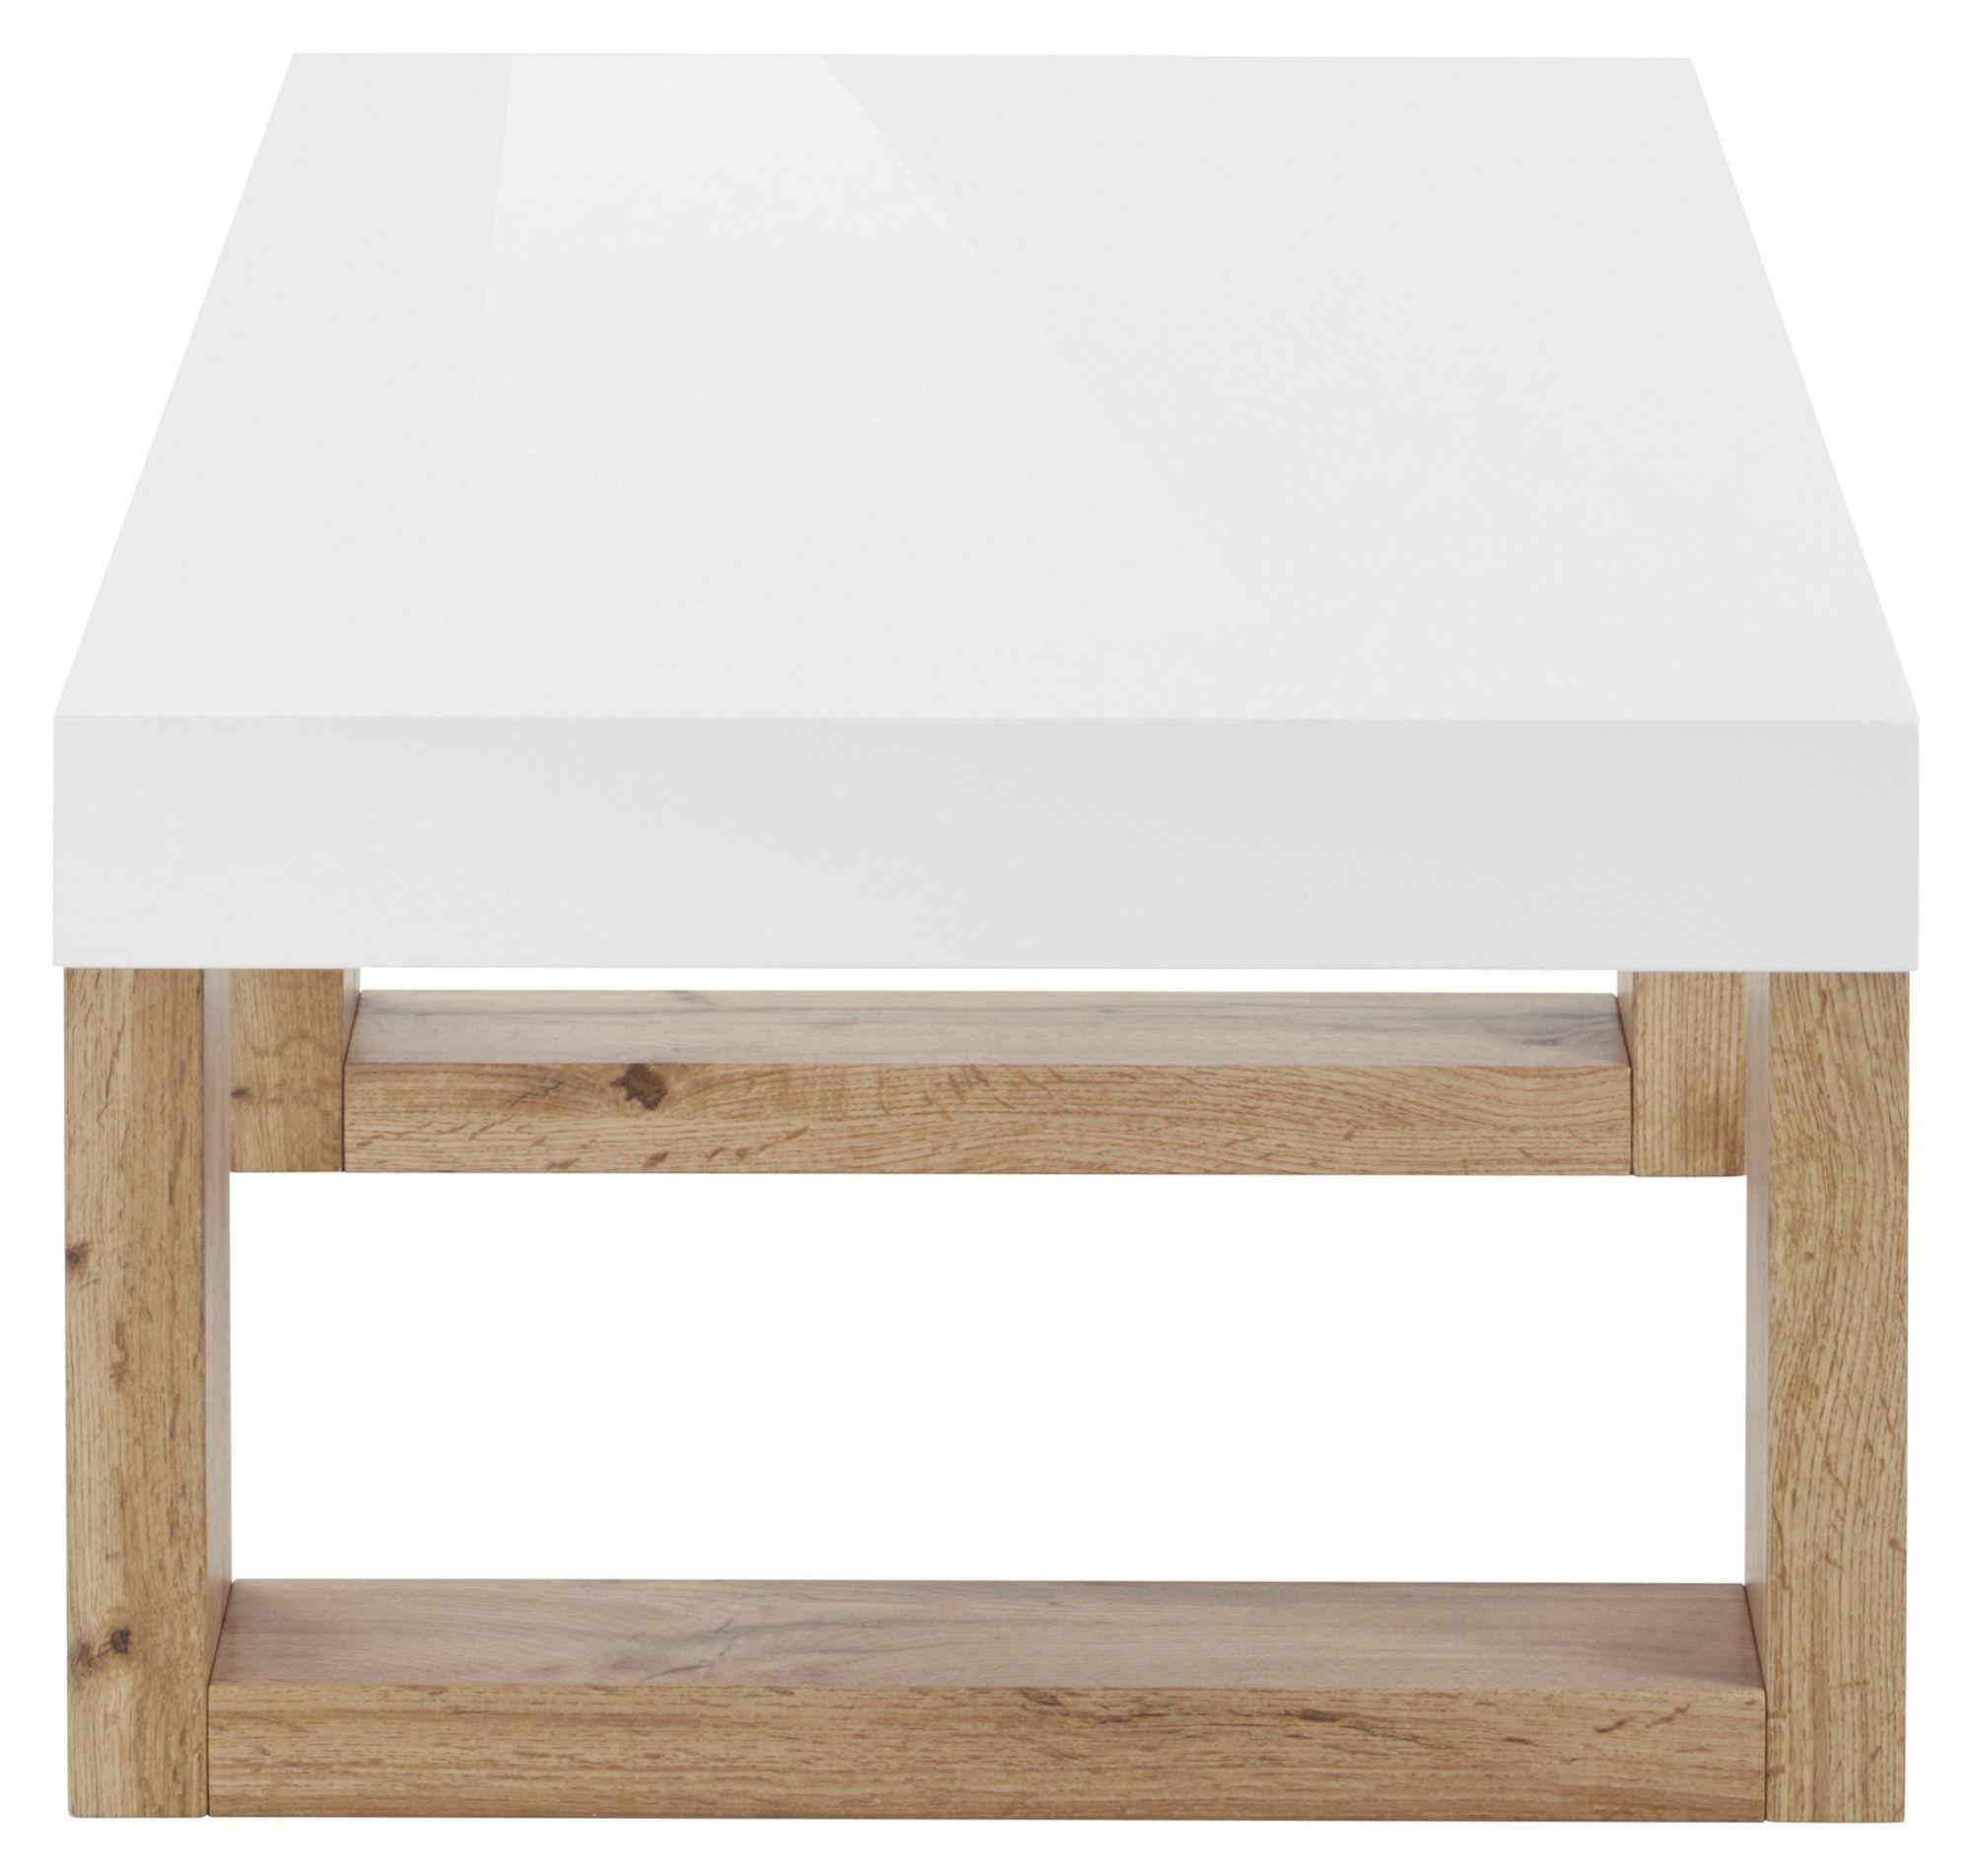 Sumo Sofabord - Hvid Højglans/Natur